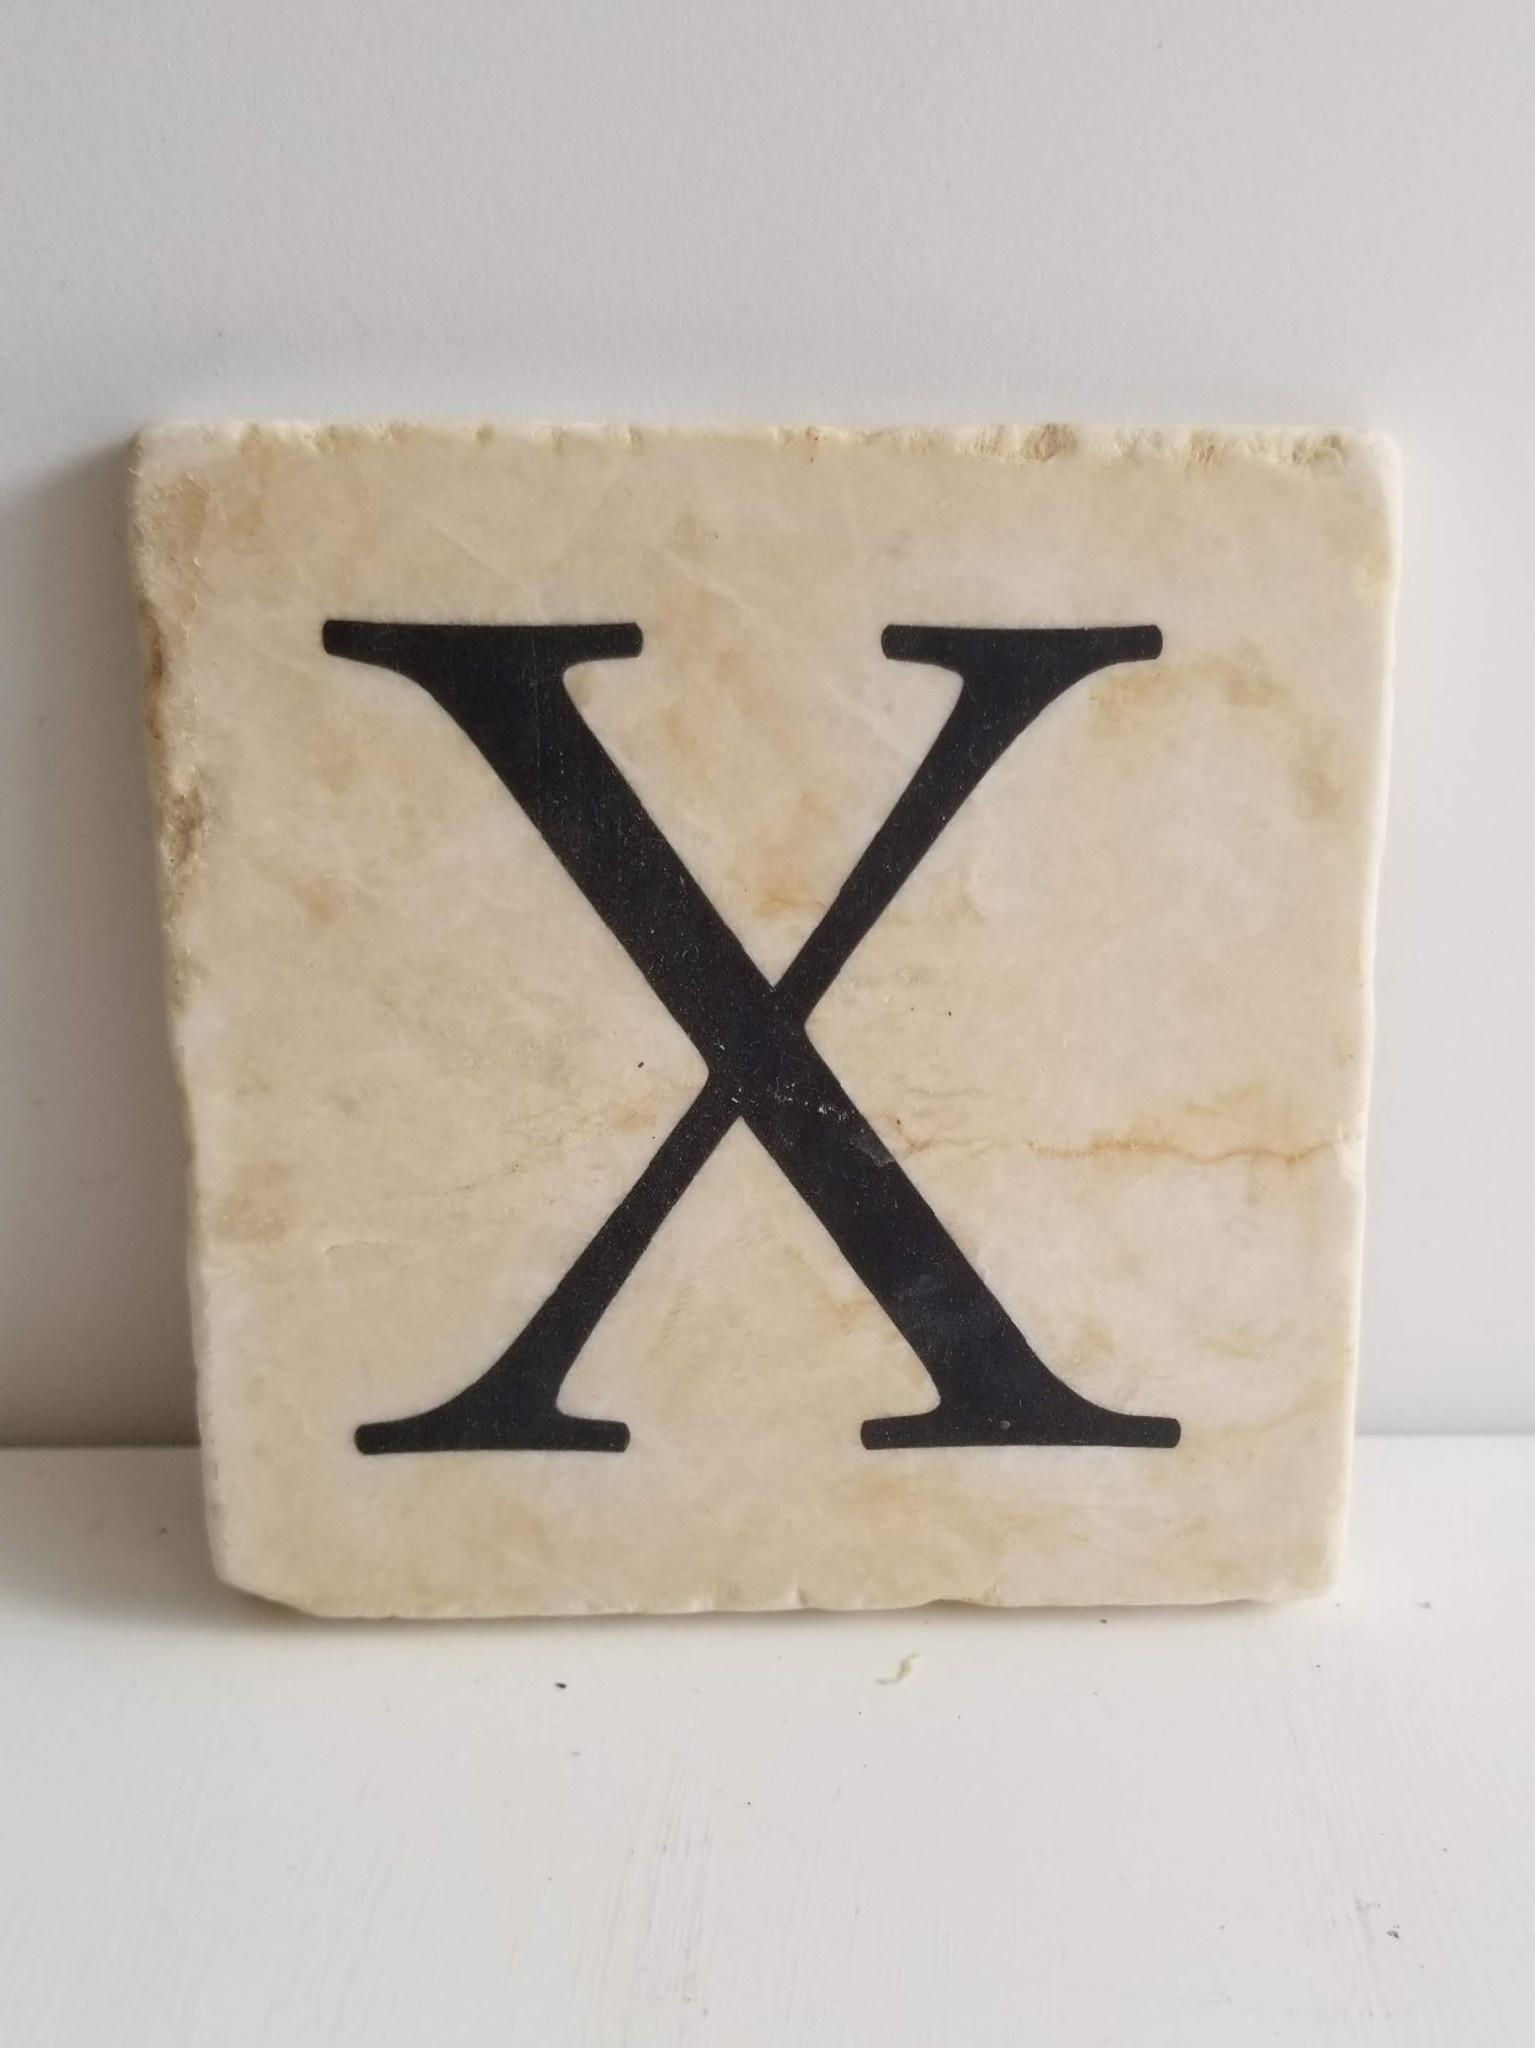 Marble Coaster - X